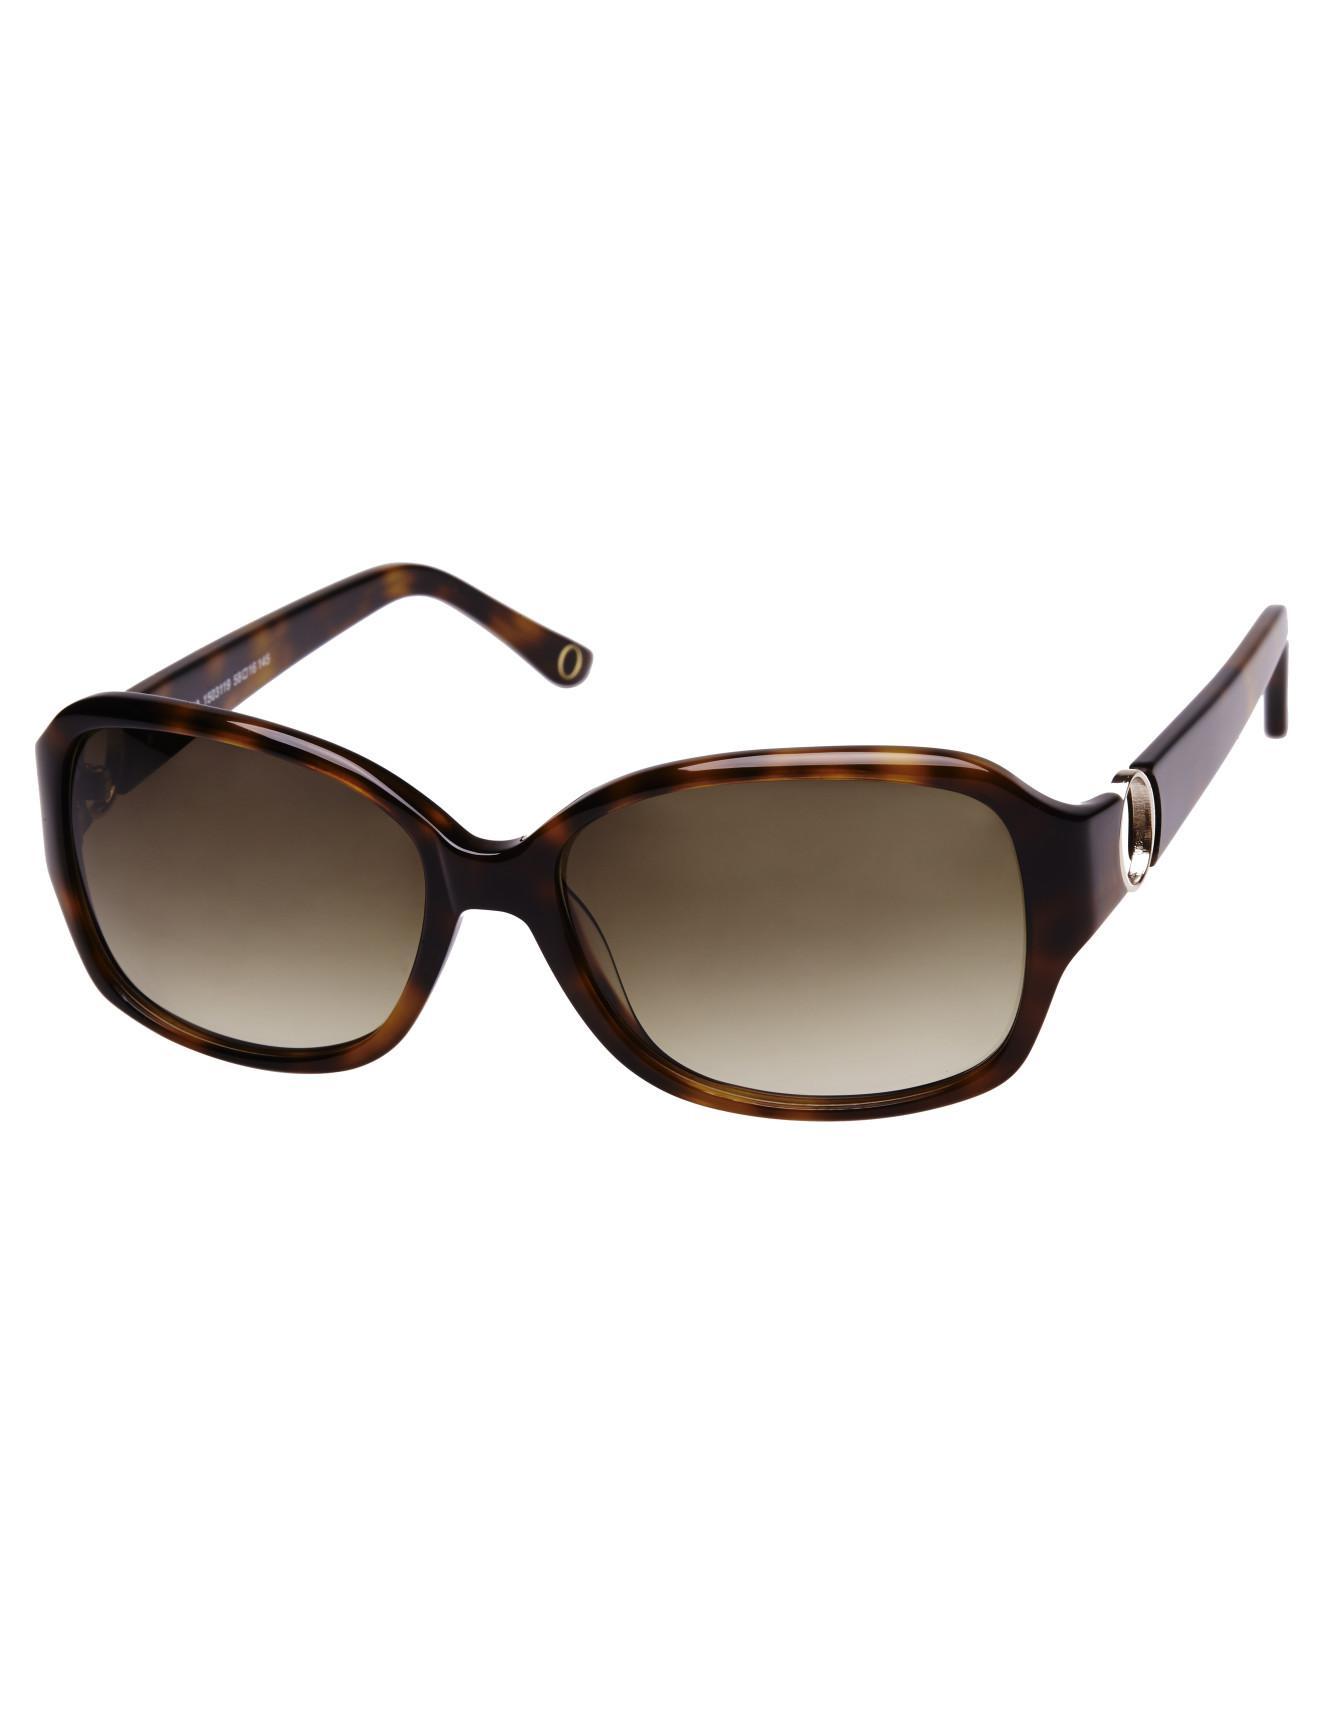 1623e14a079 Gallery. Previously sold at  David Jones · Women s Garrett Leight Hampton Women s  Celine Shadow Women s Green Sunglasses ...